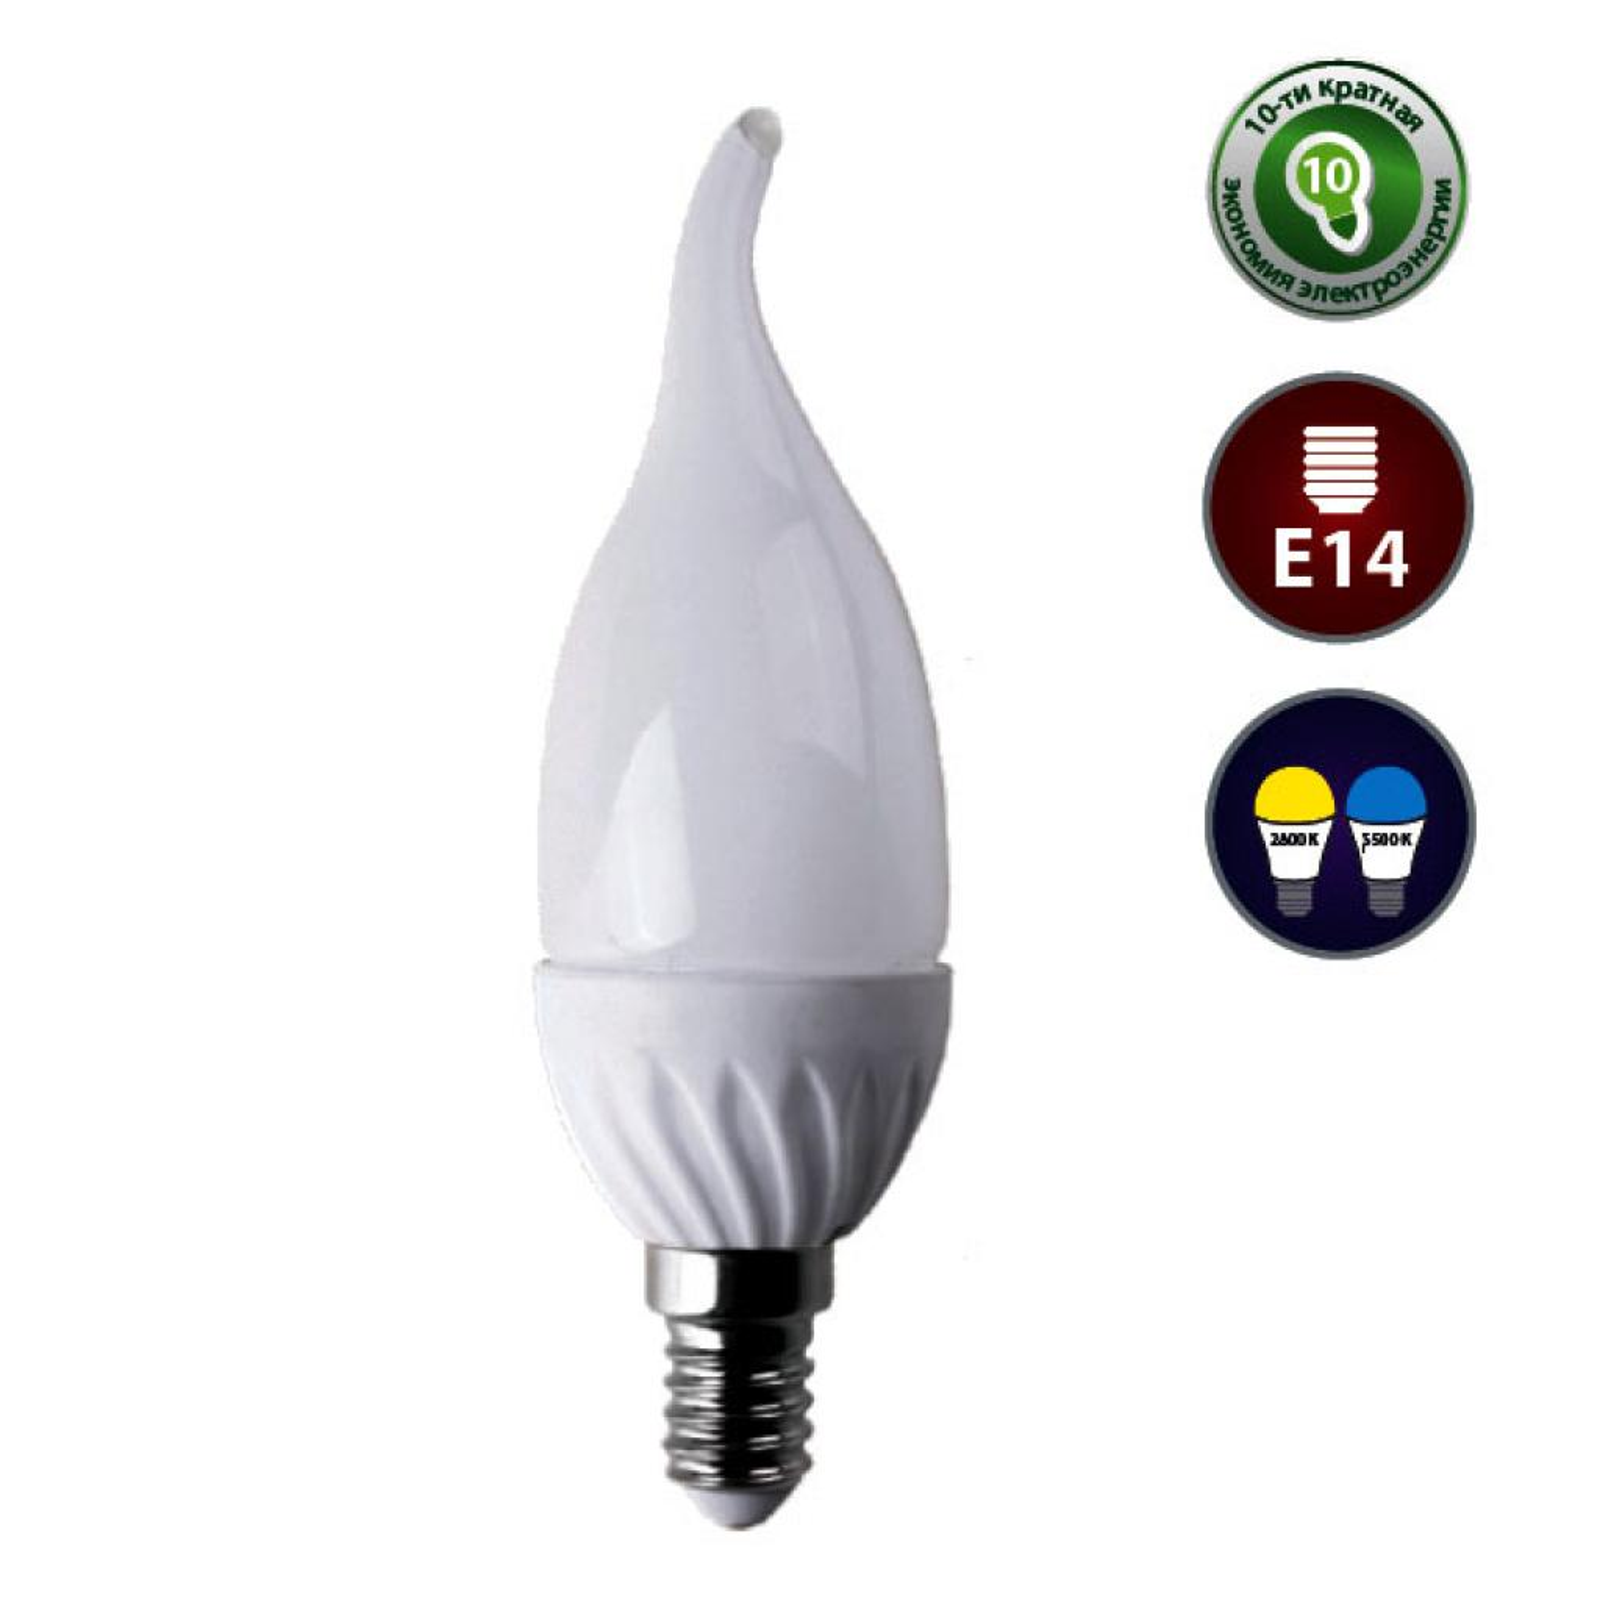 Лампочка SATURN ST-LL14.03 CW